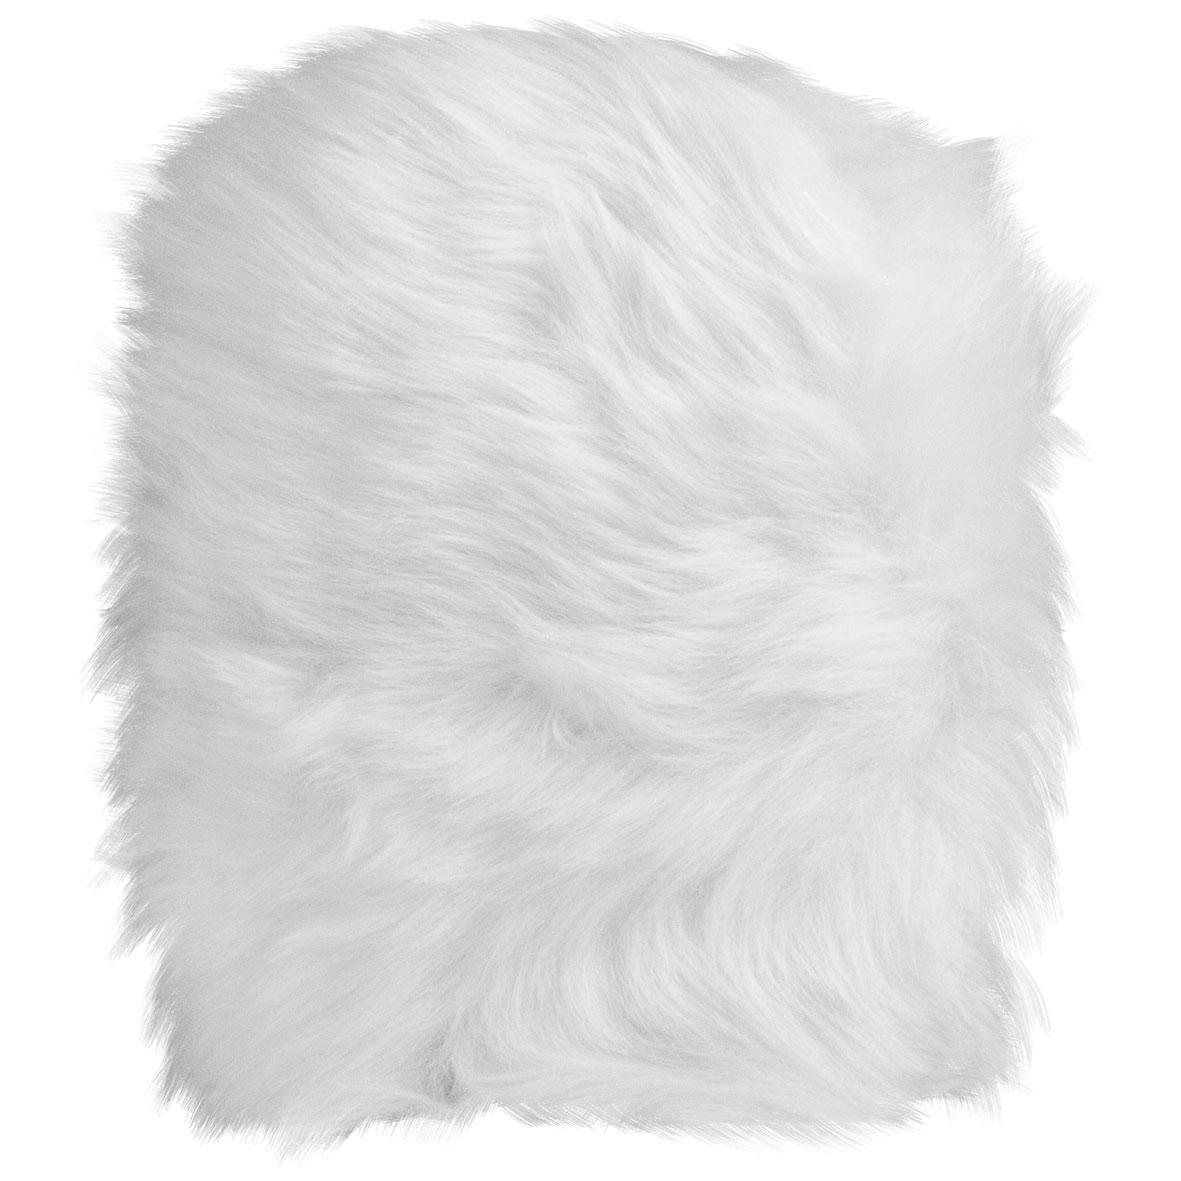 G3 Pro Lambs Wool Wash Mitt